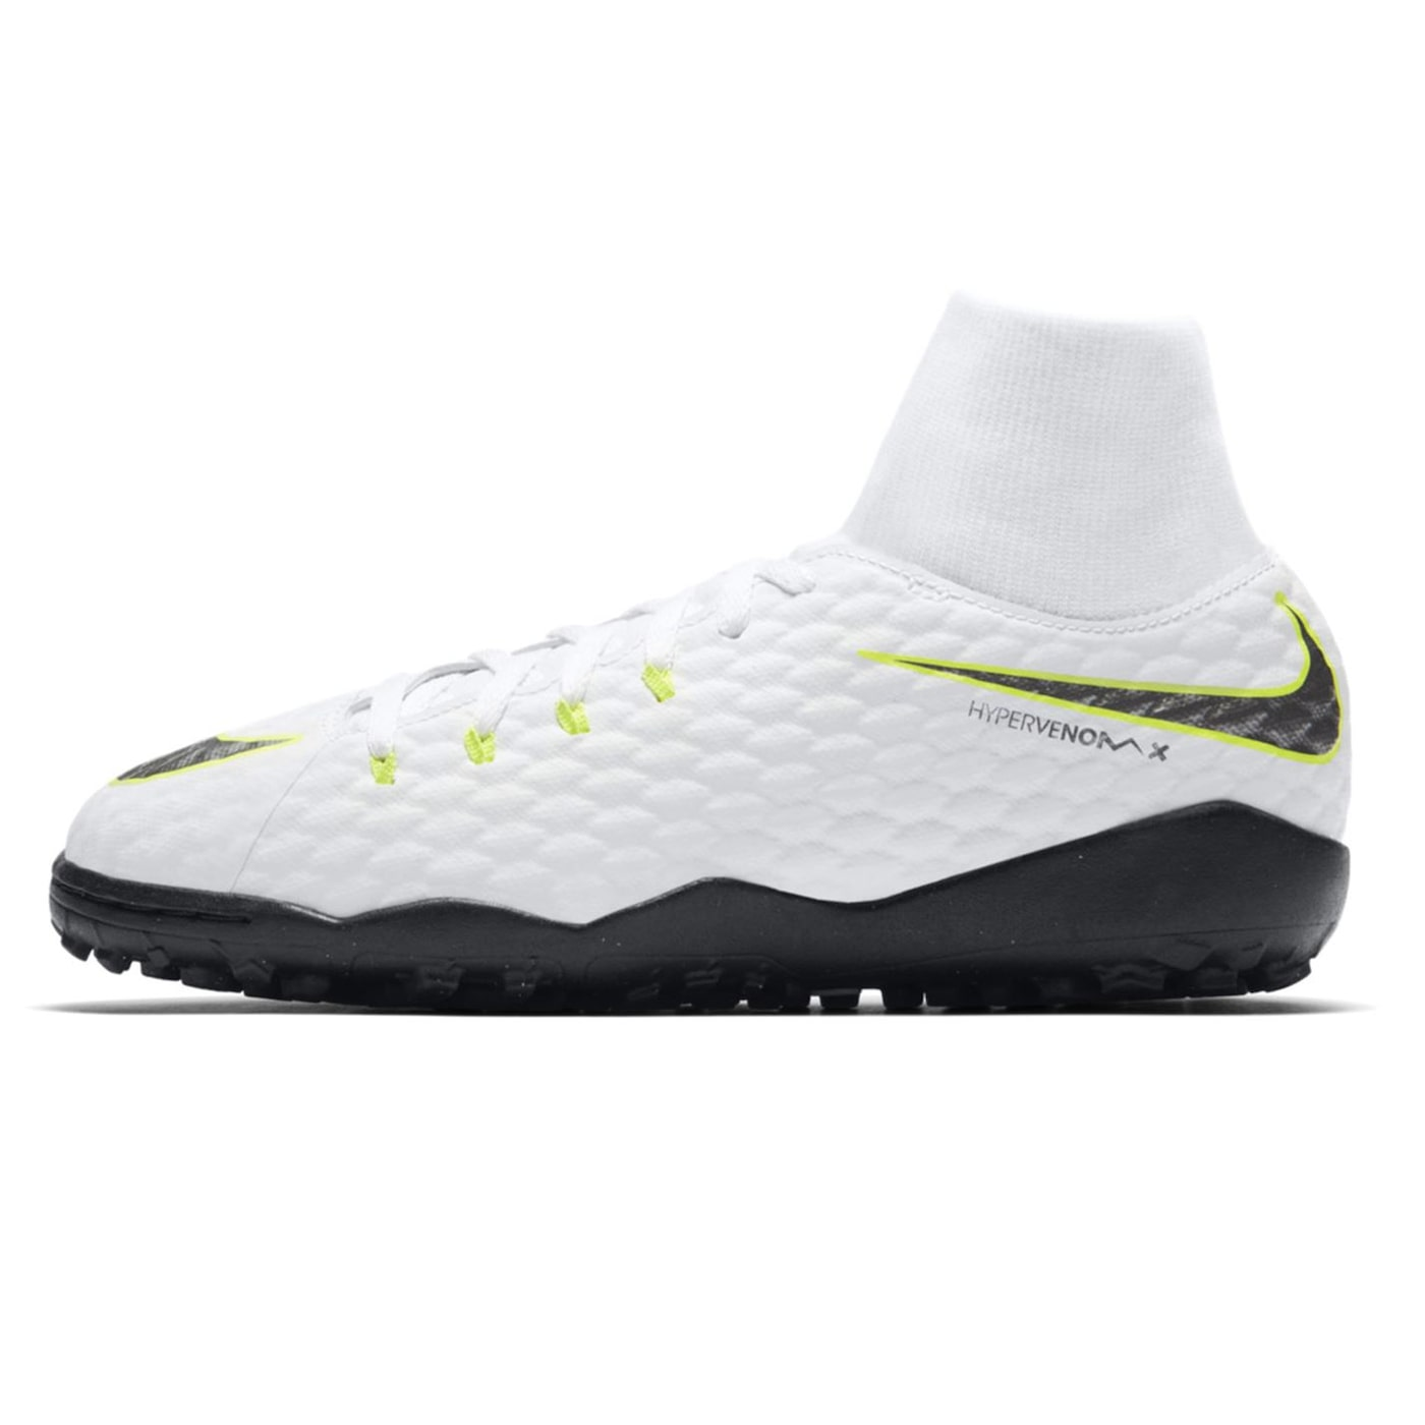 Nike Hypervenom Phantom Academy DF Junior Astro Turf Trainers